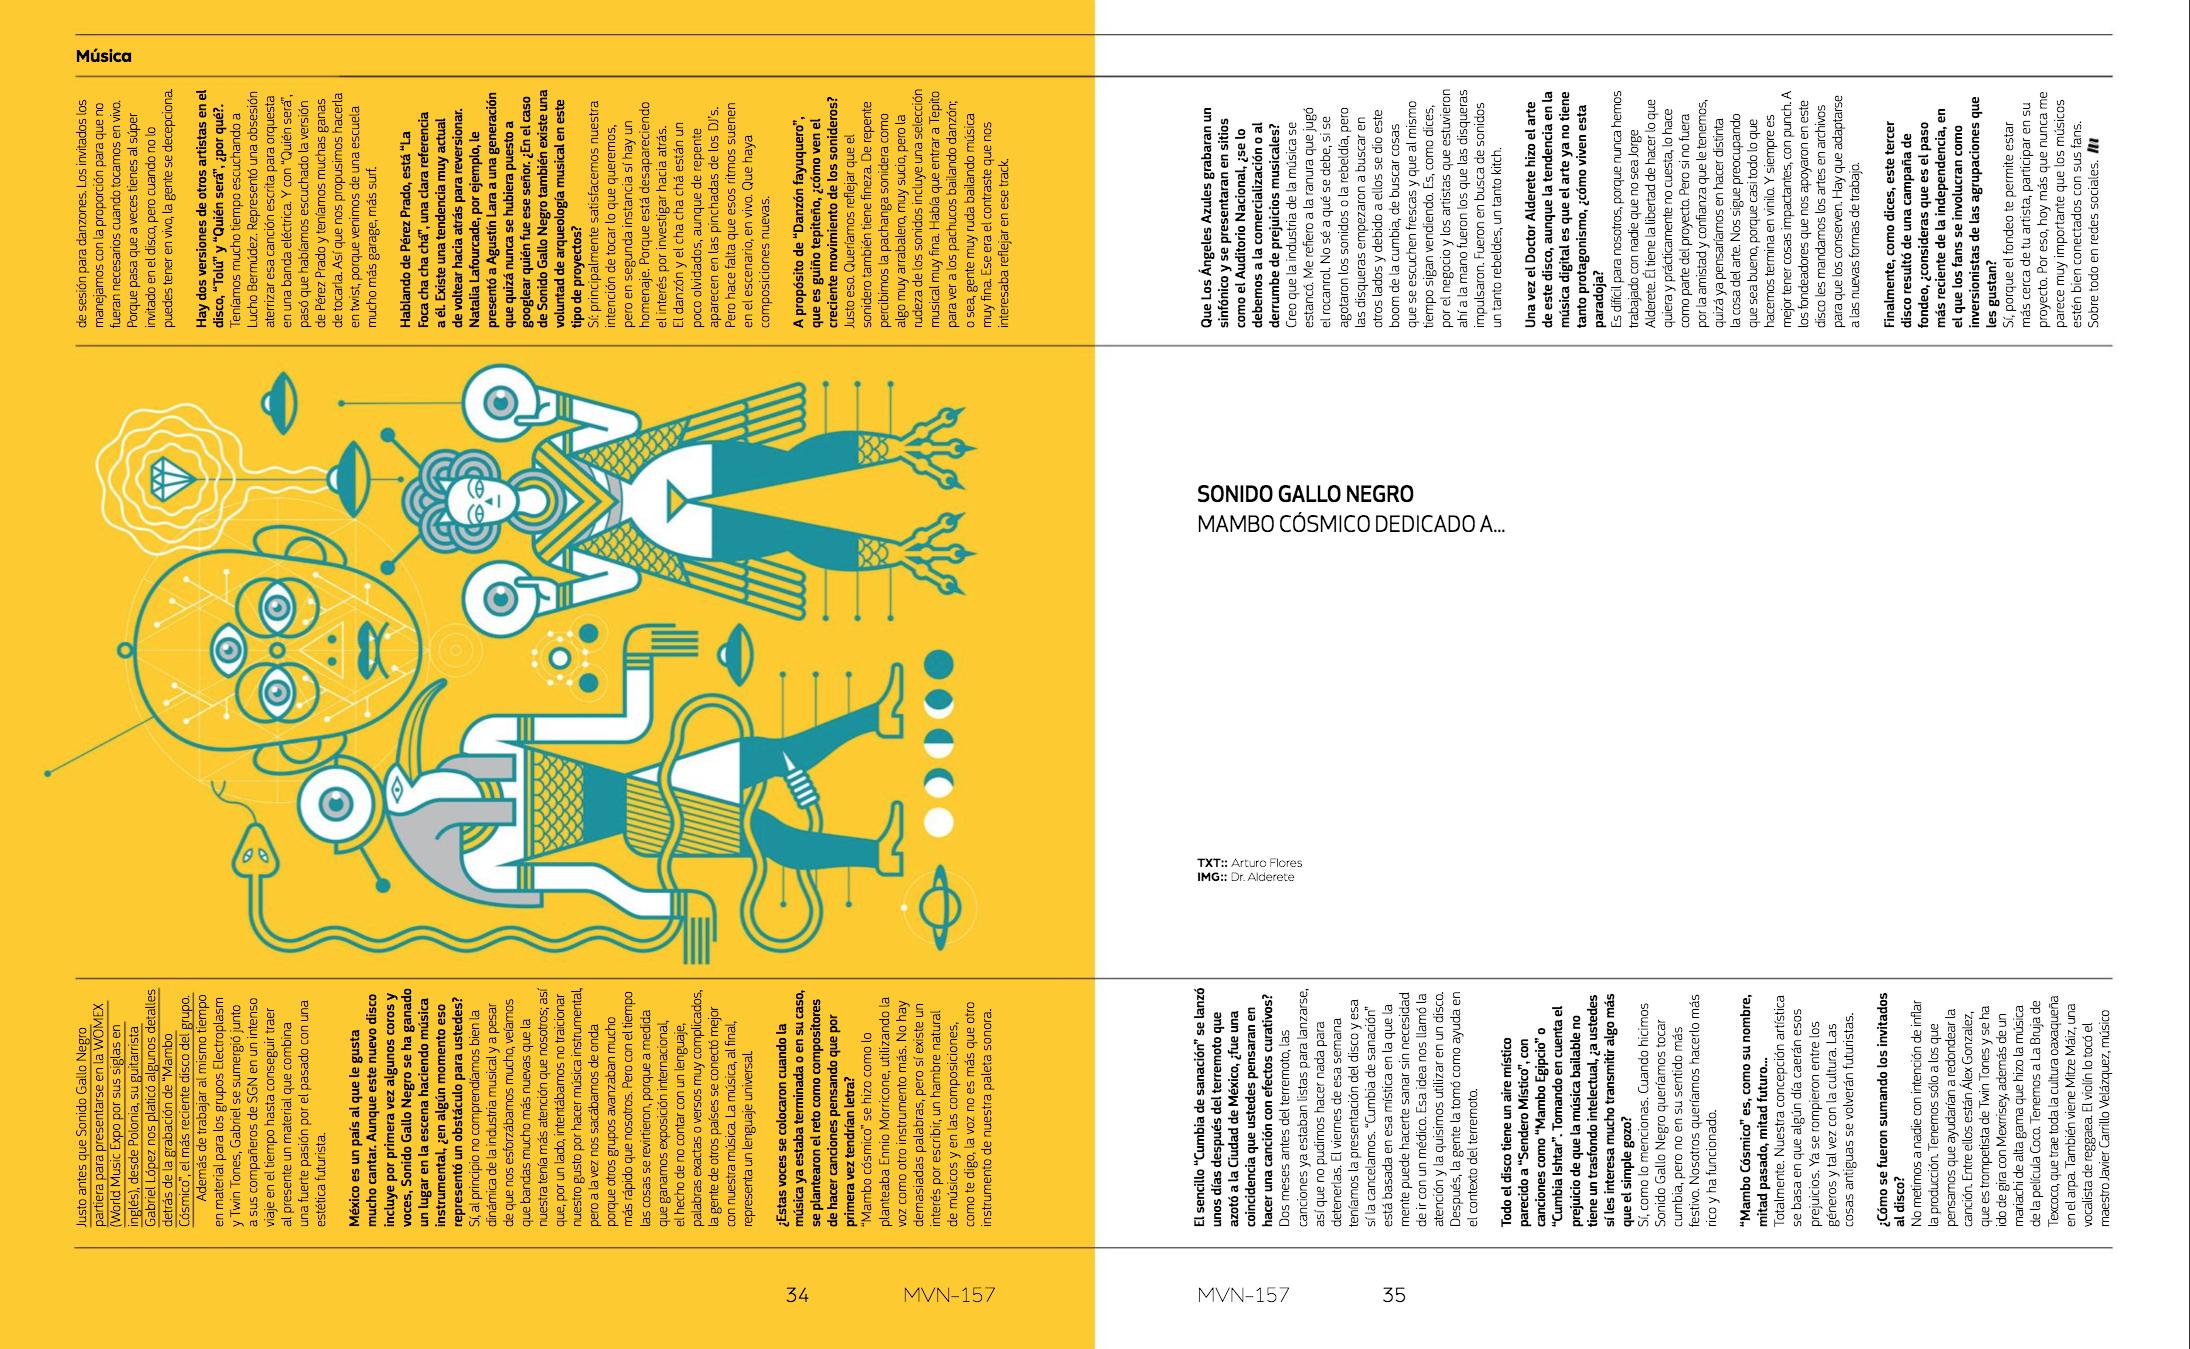 Gallo Negro  #ALV  #gallonegro #MinimalDesign  #Minimal #RevistaMarvin #Marvin #ArtDirection #Magazine #EditorialDesign #Editorial #GraphicDesign